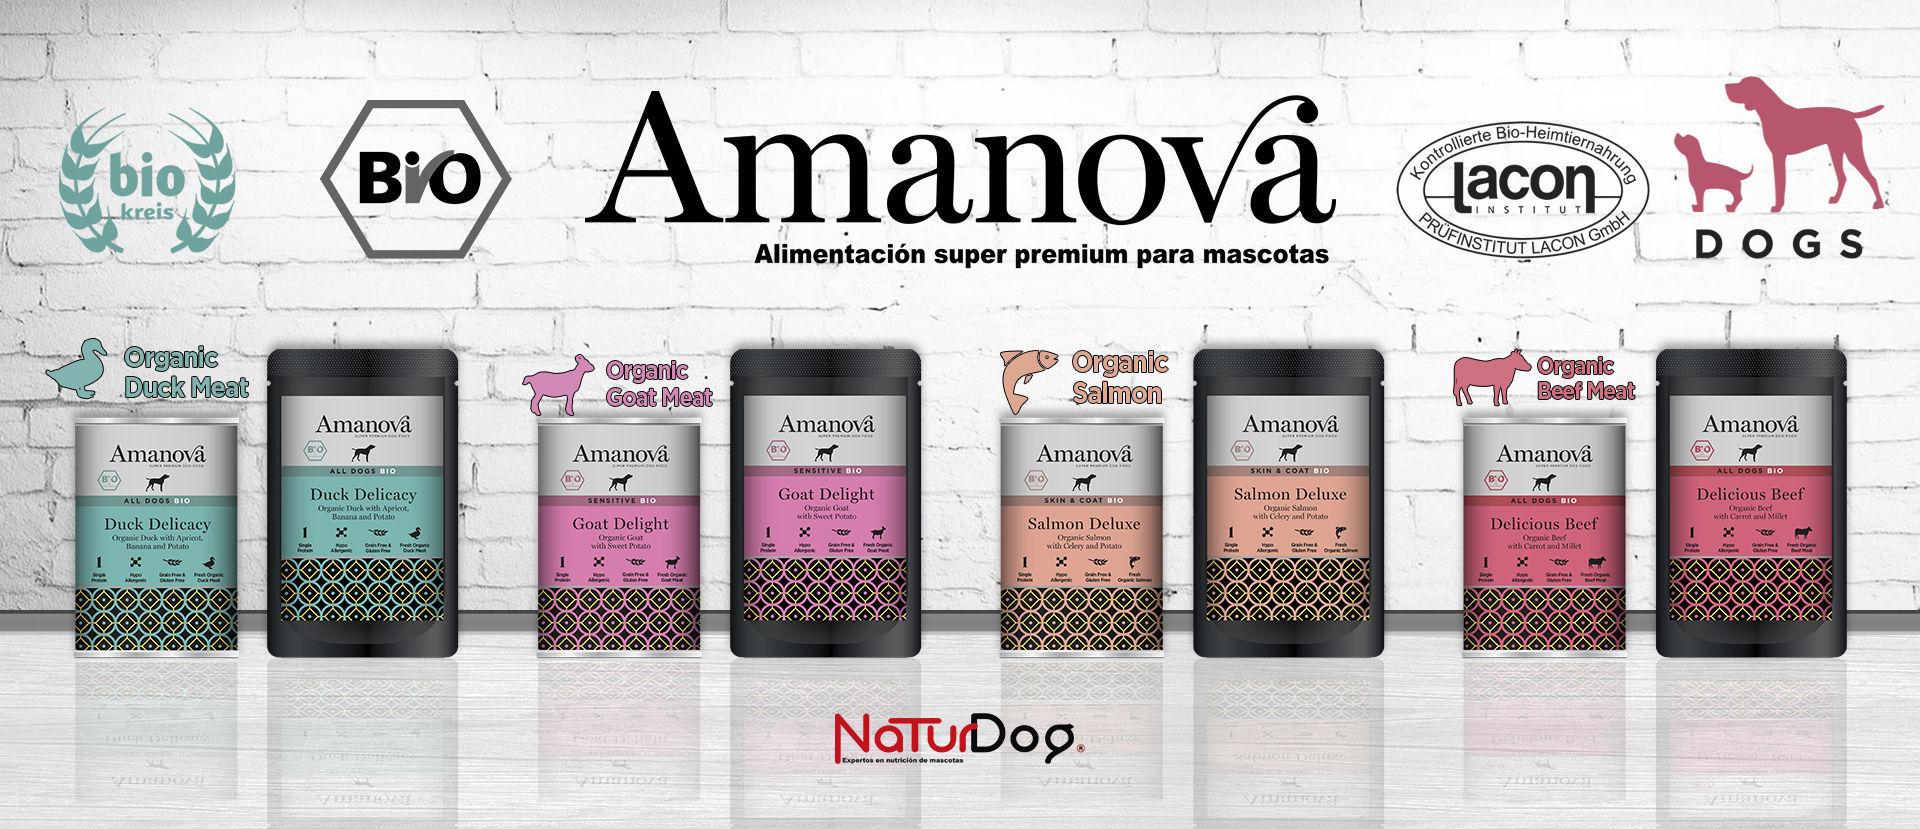 Amanova dogs